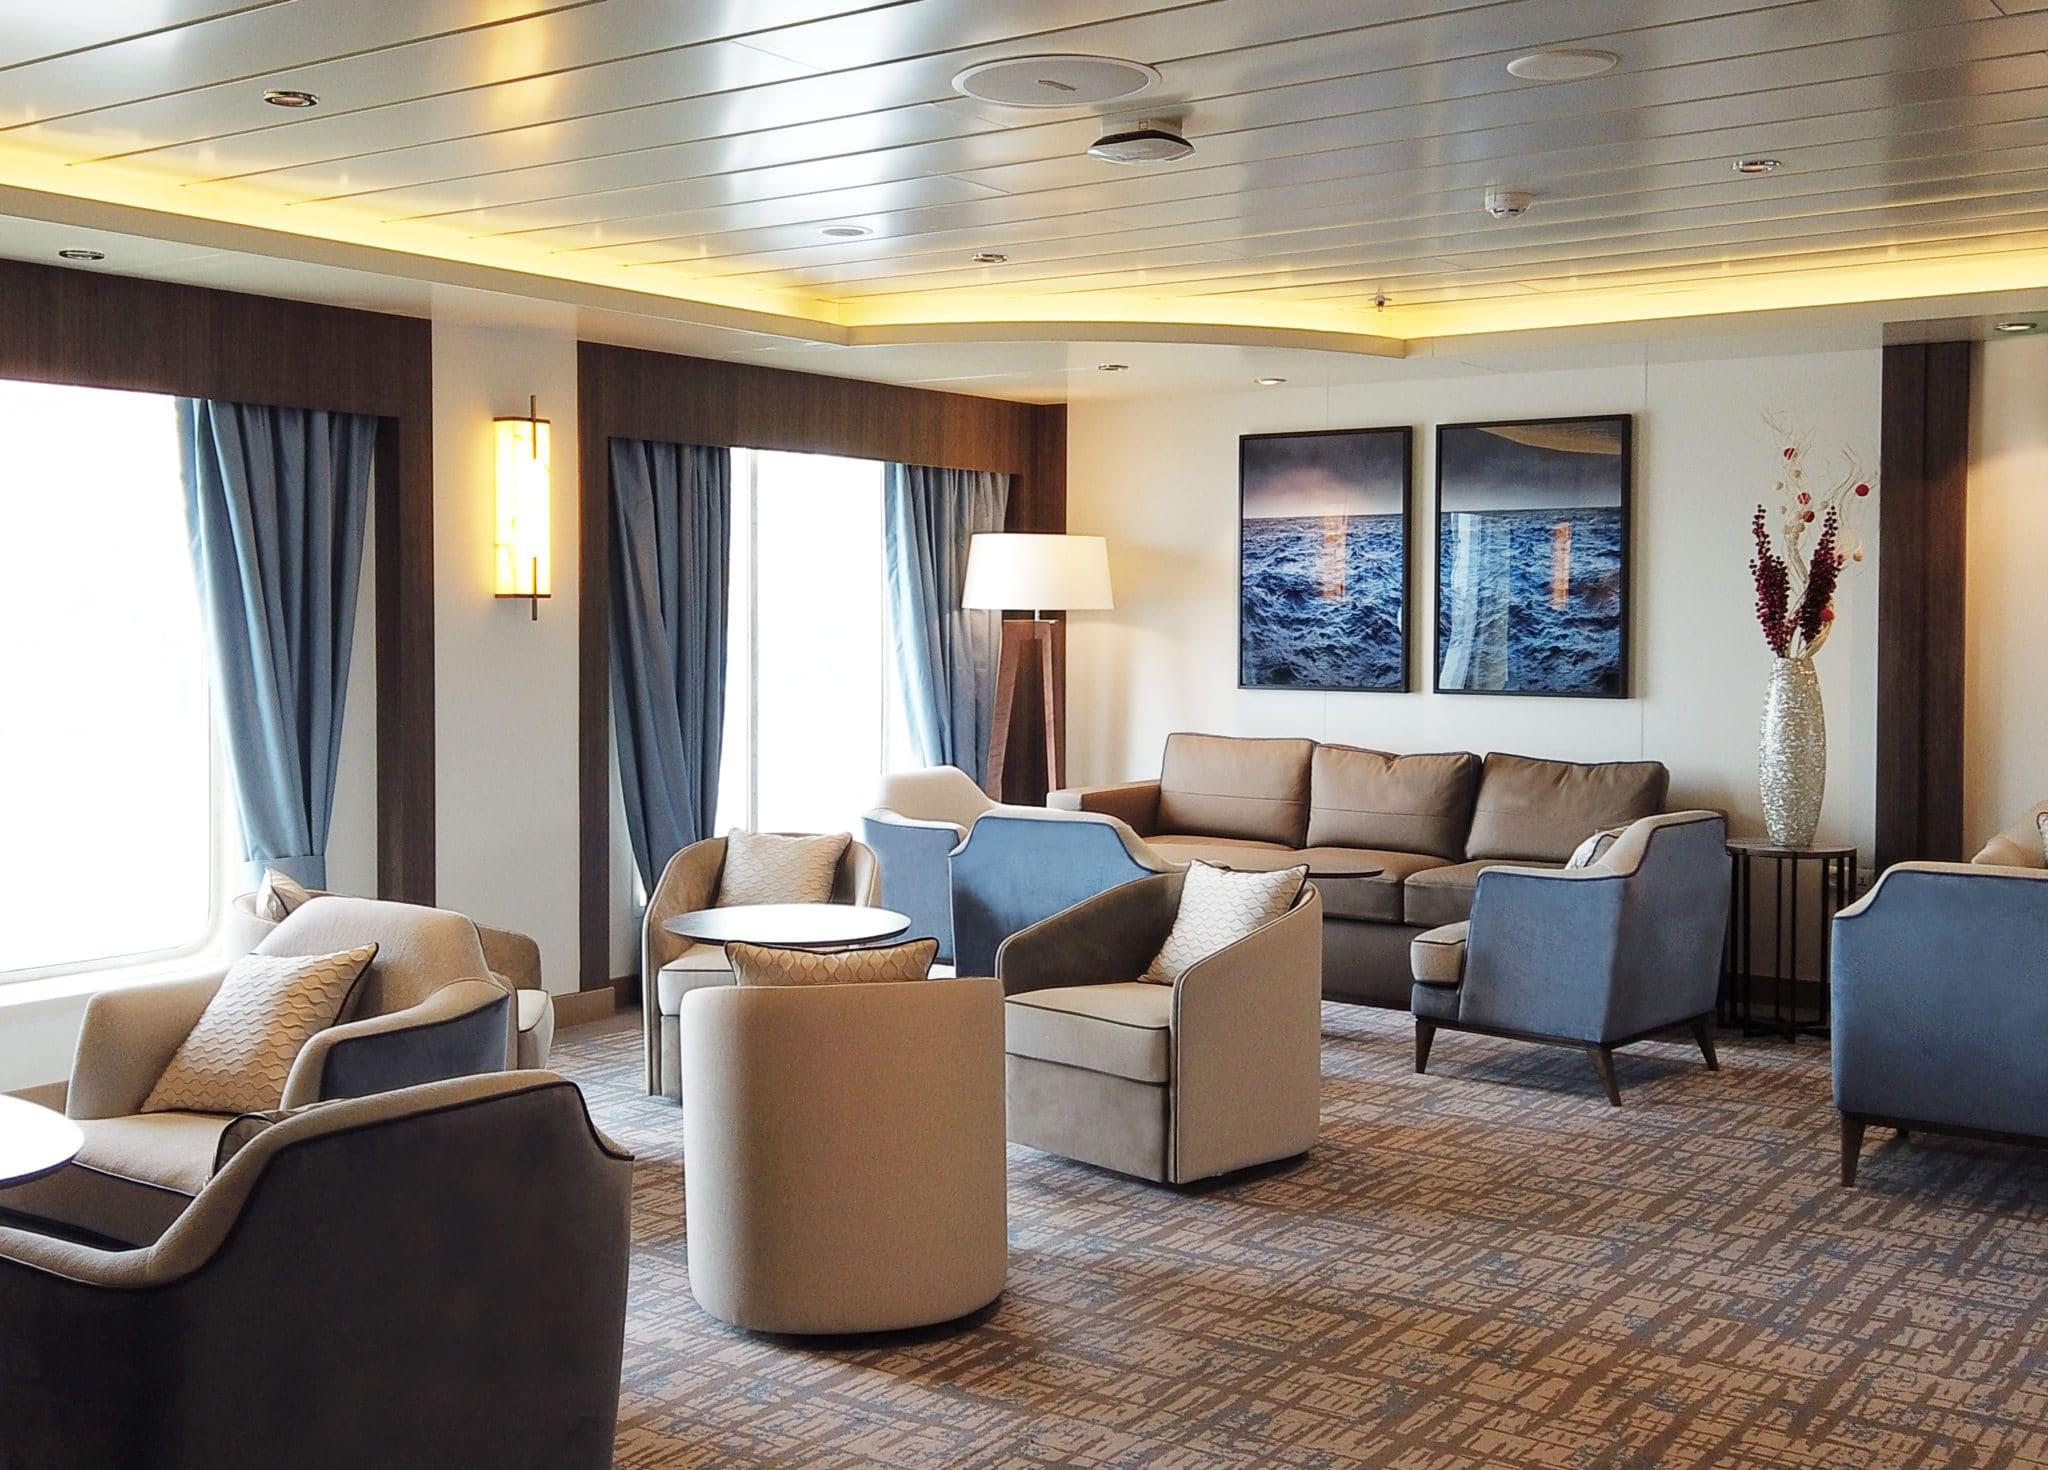 greg-mortimer-lounge-area-scaled